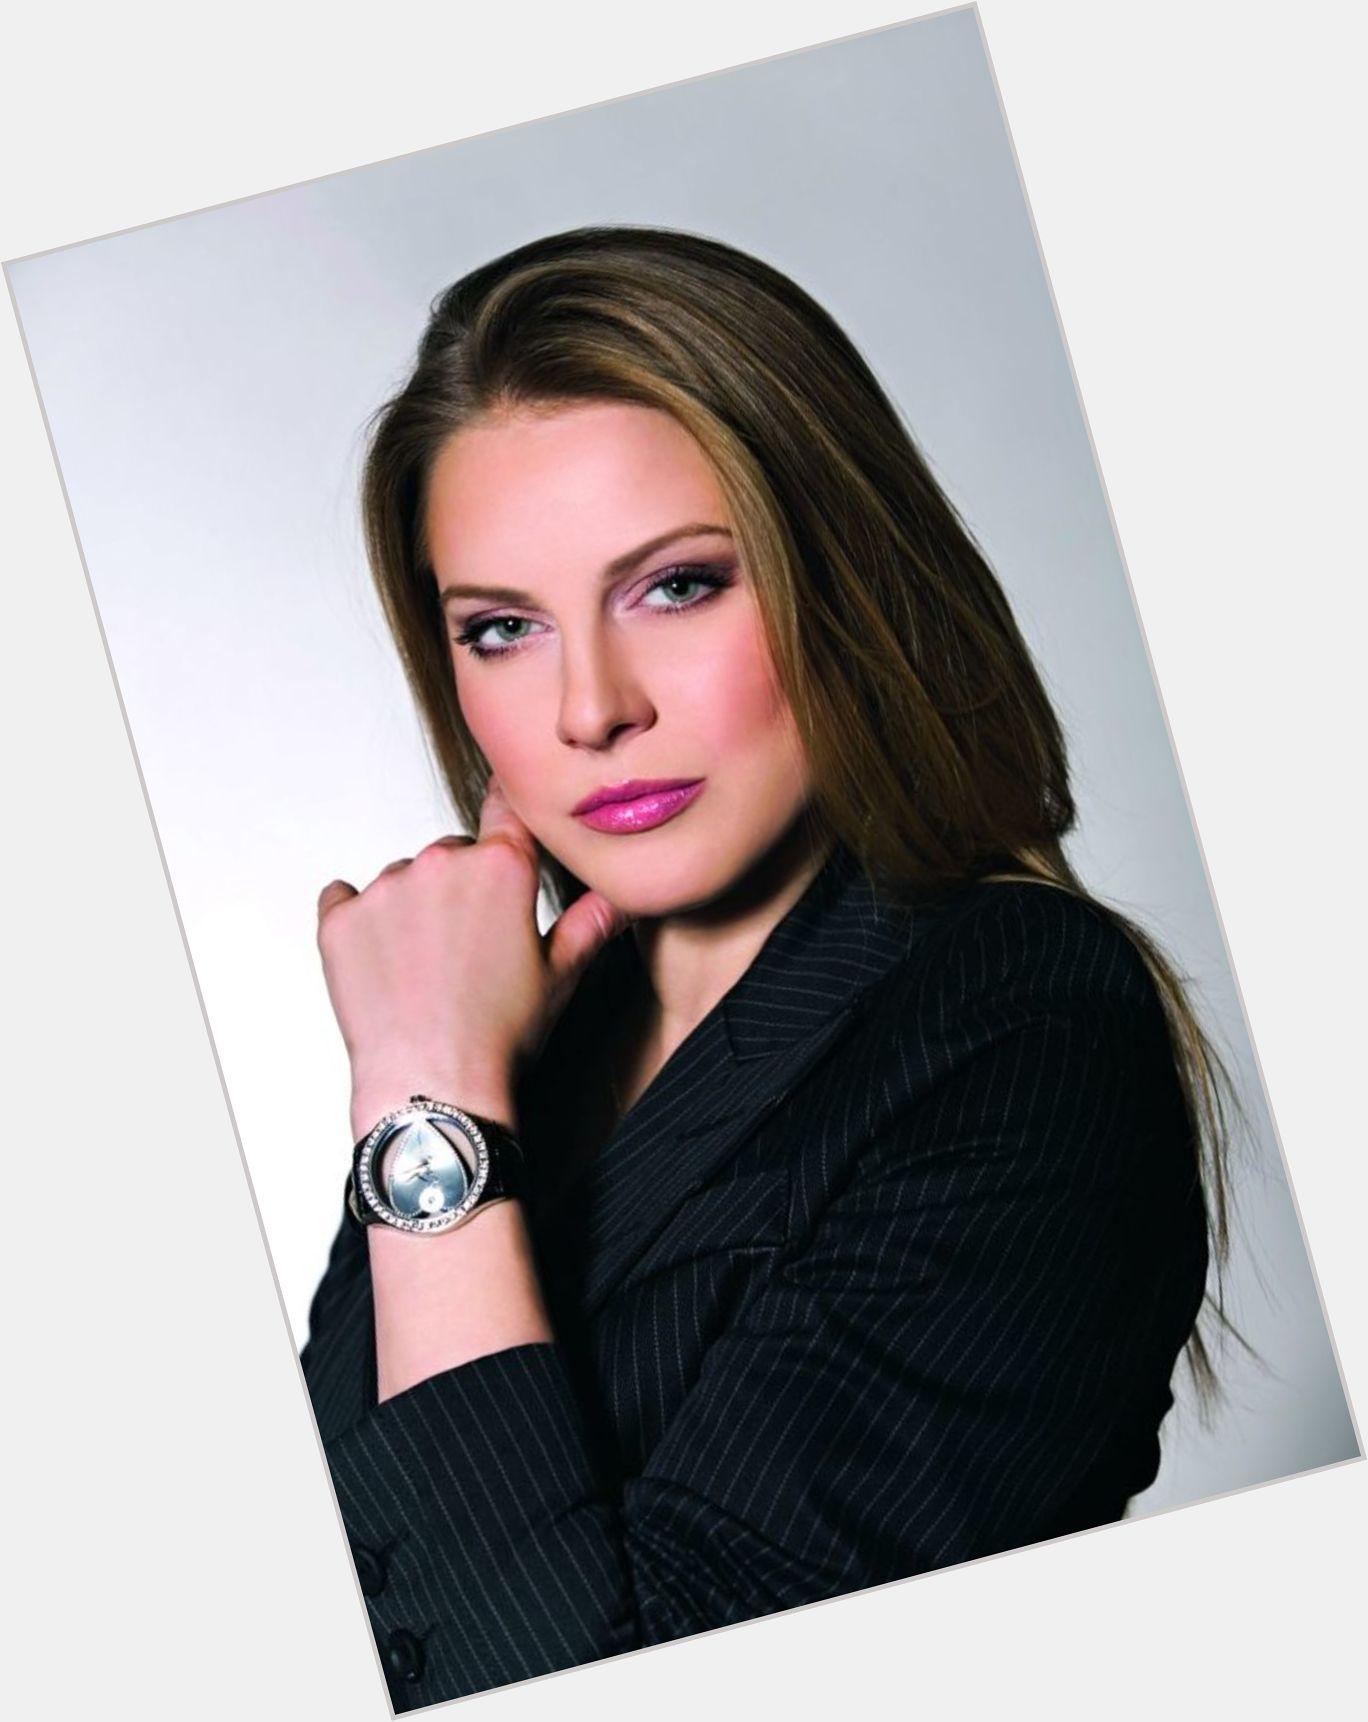 Ana Sakic ana sakic   official site for woman crush wednesday #wcw